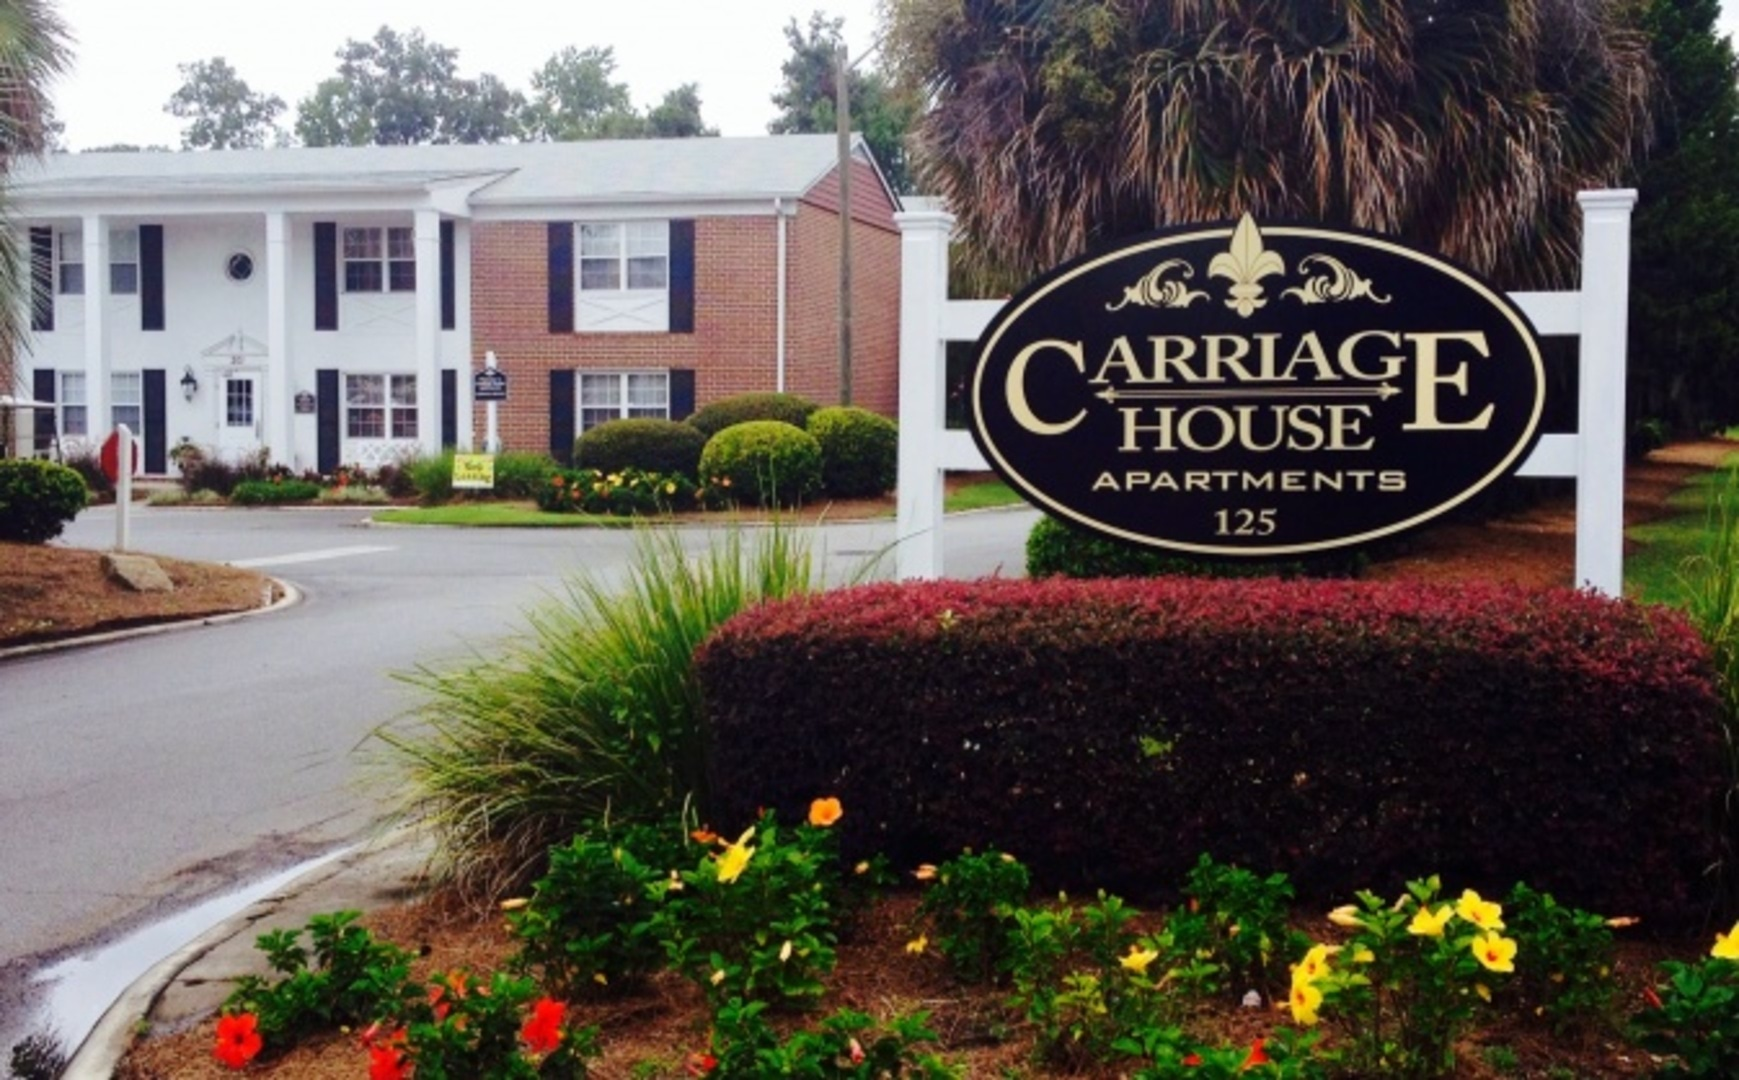 Jpg - Carriage house apartment